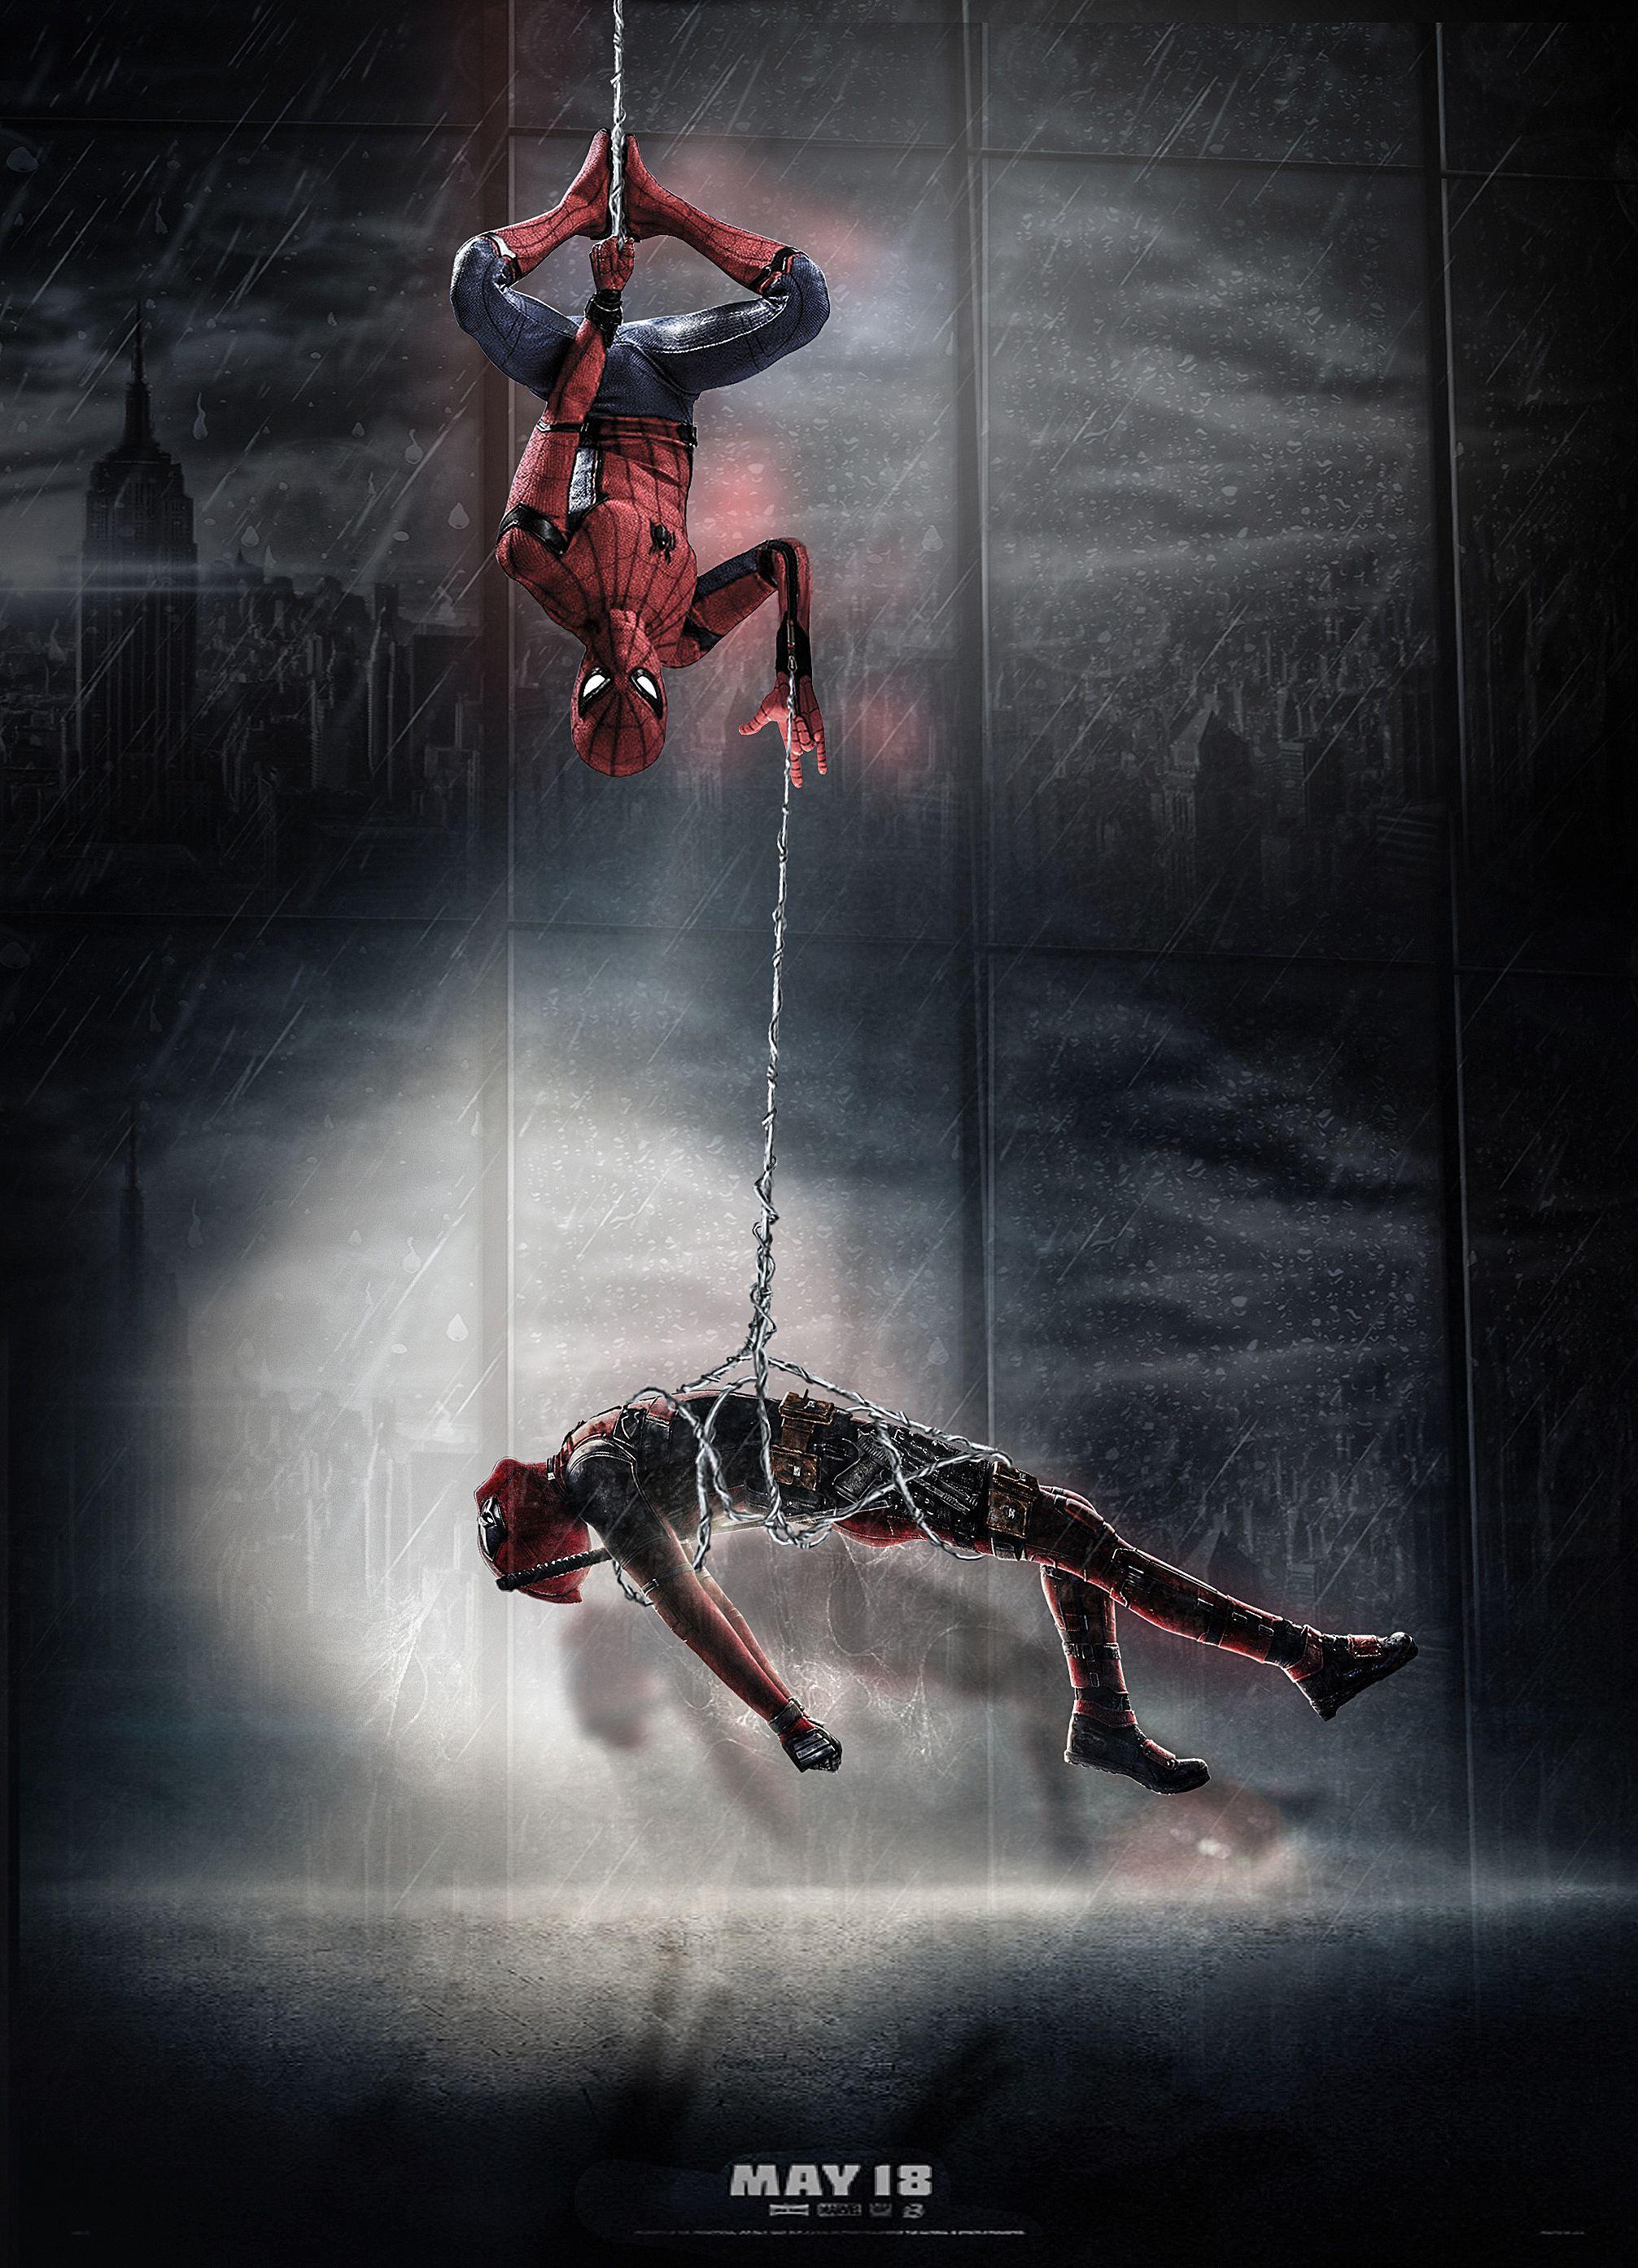 Spiderman Hangingdeadpool Funny Photoshop Visualarts Marvel Wallpaper